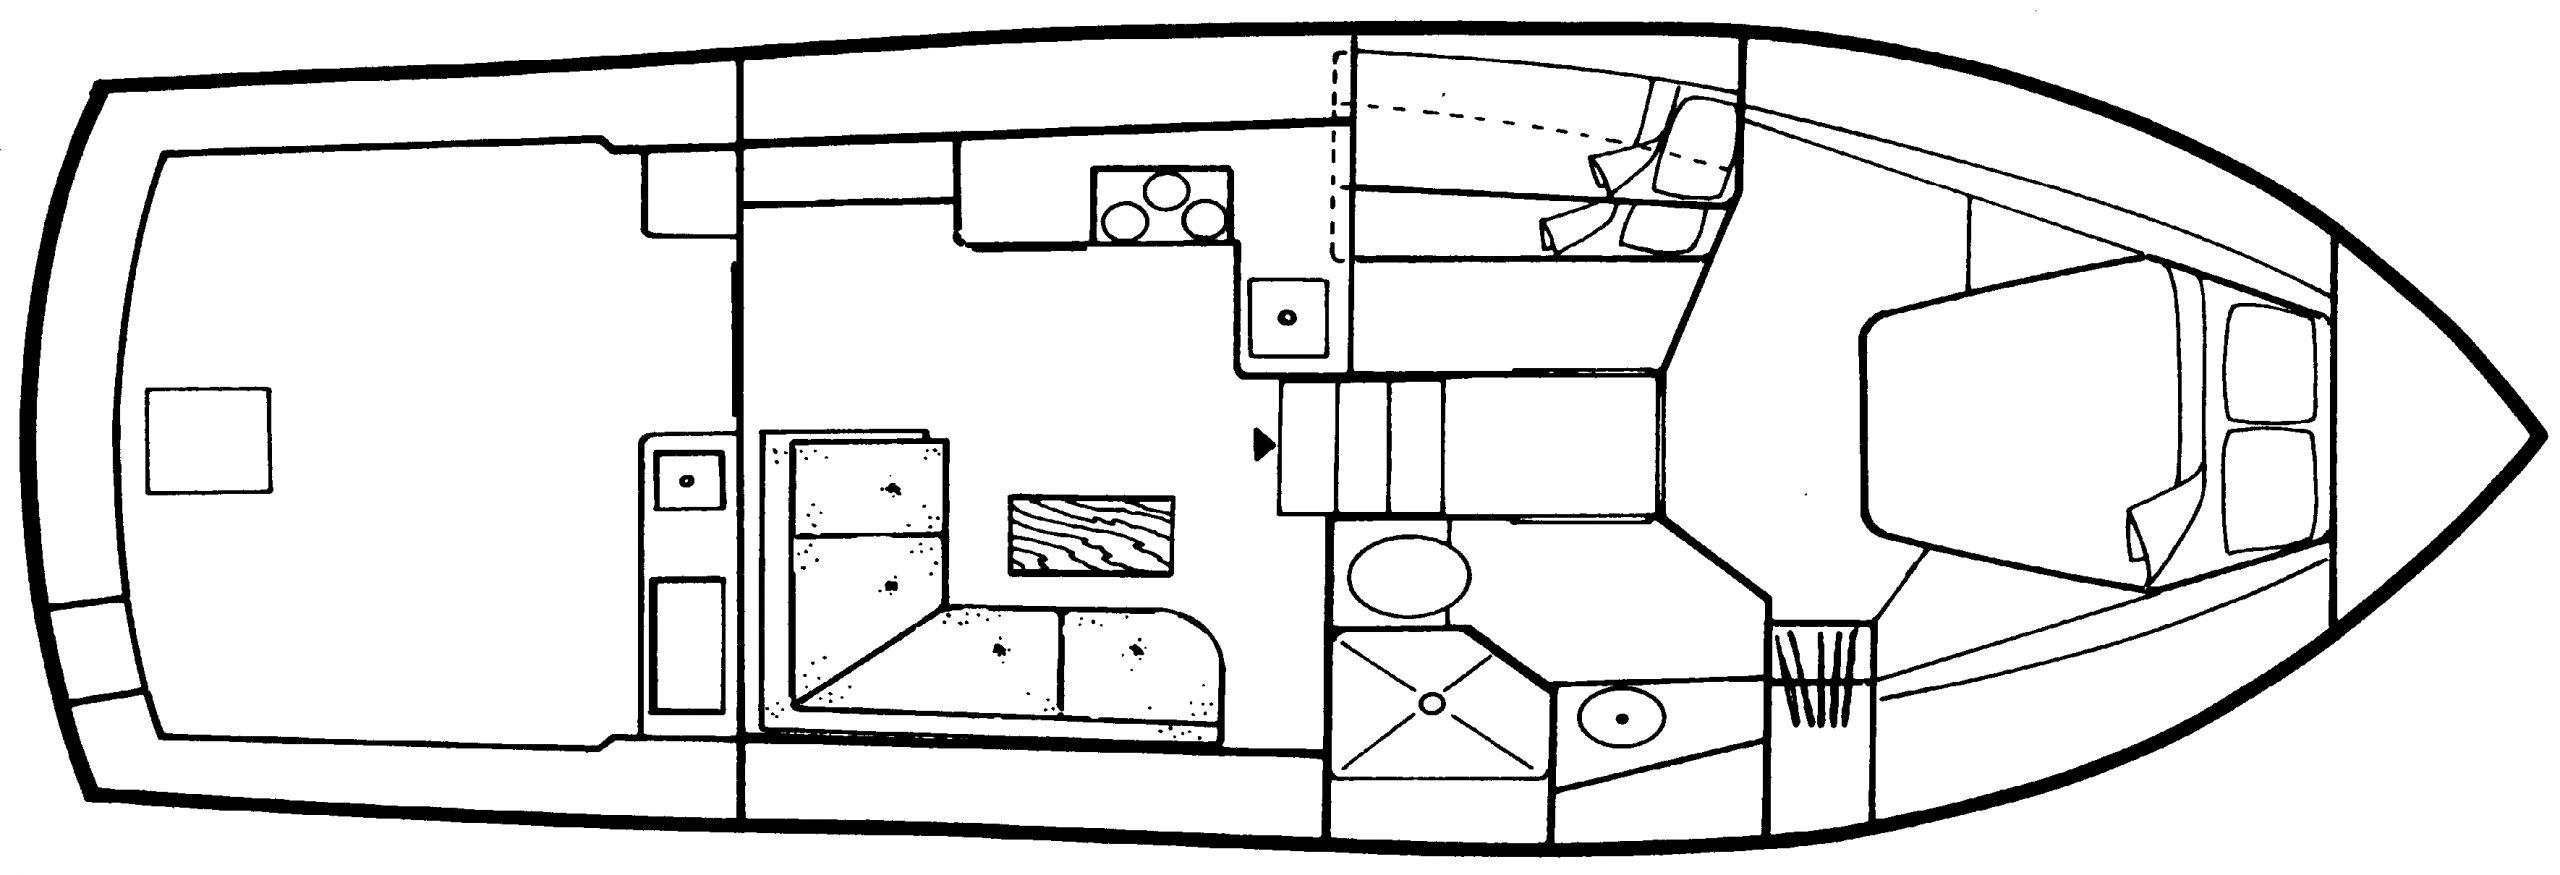 35 Sport Yacht Floor Plan 2